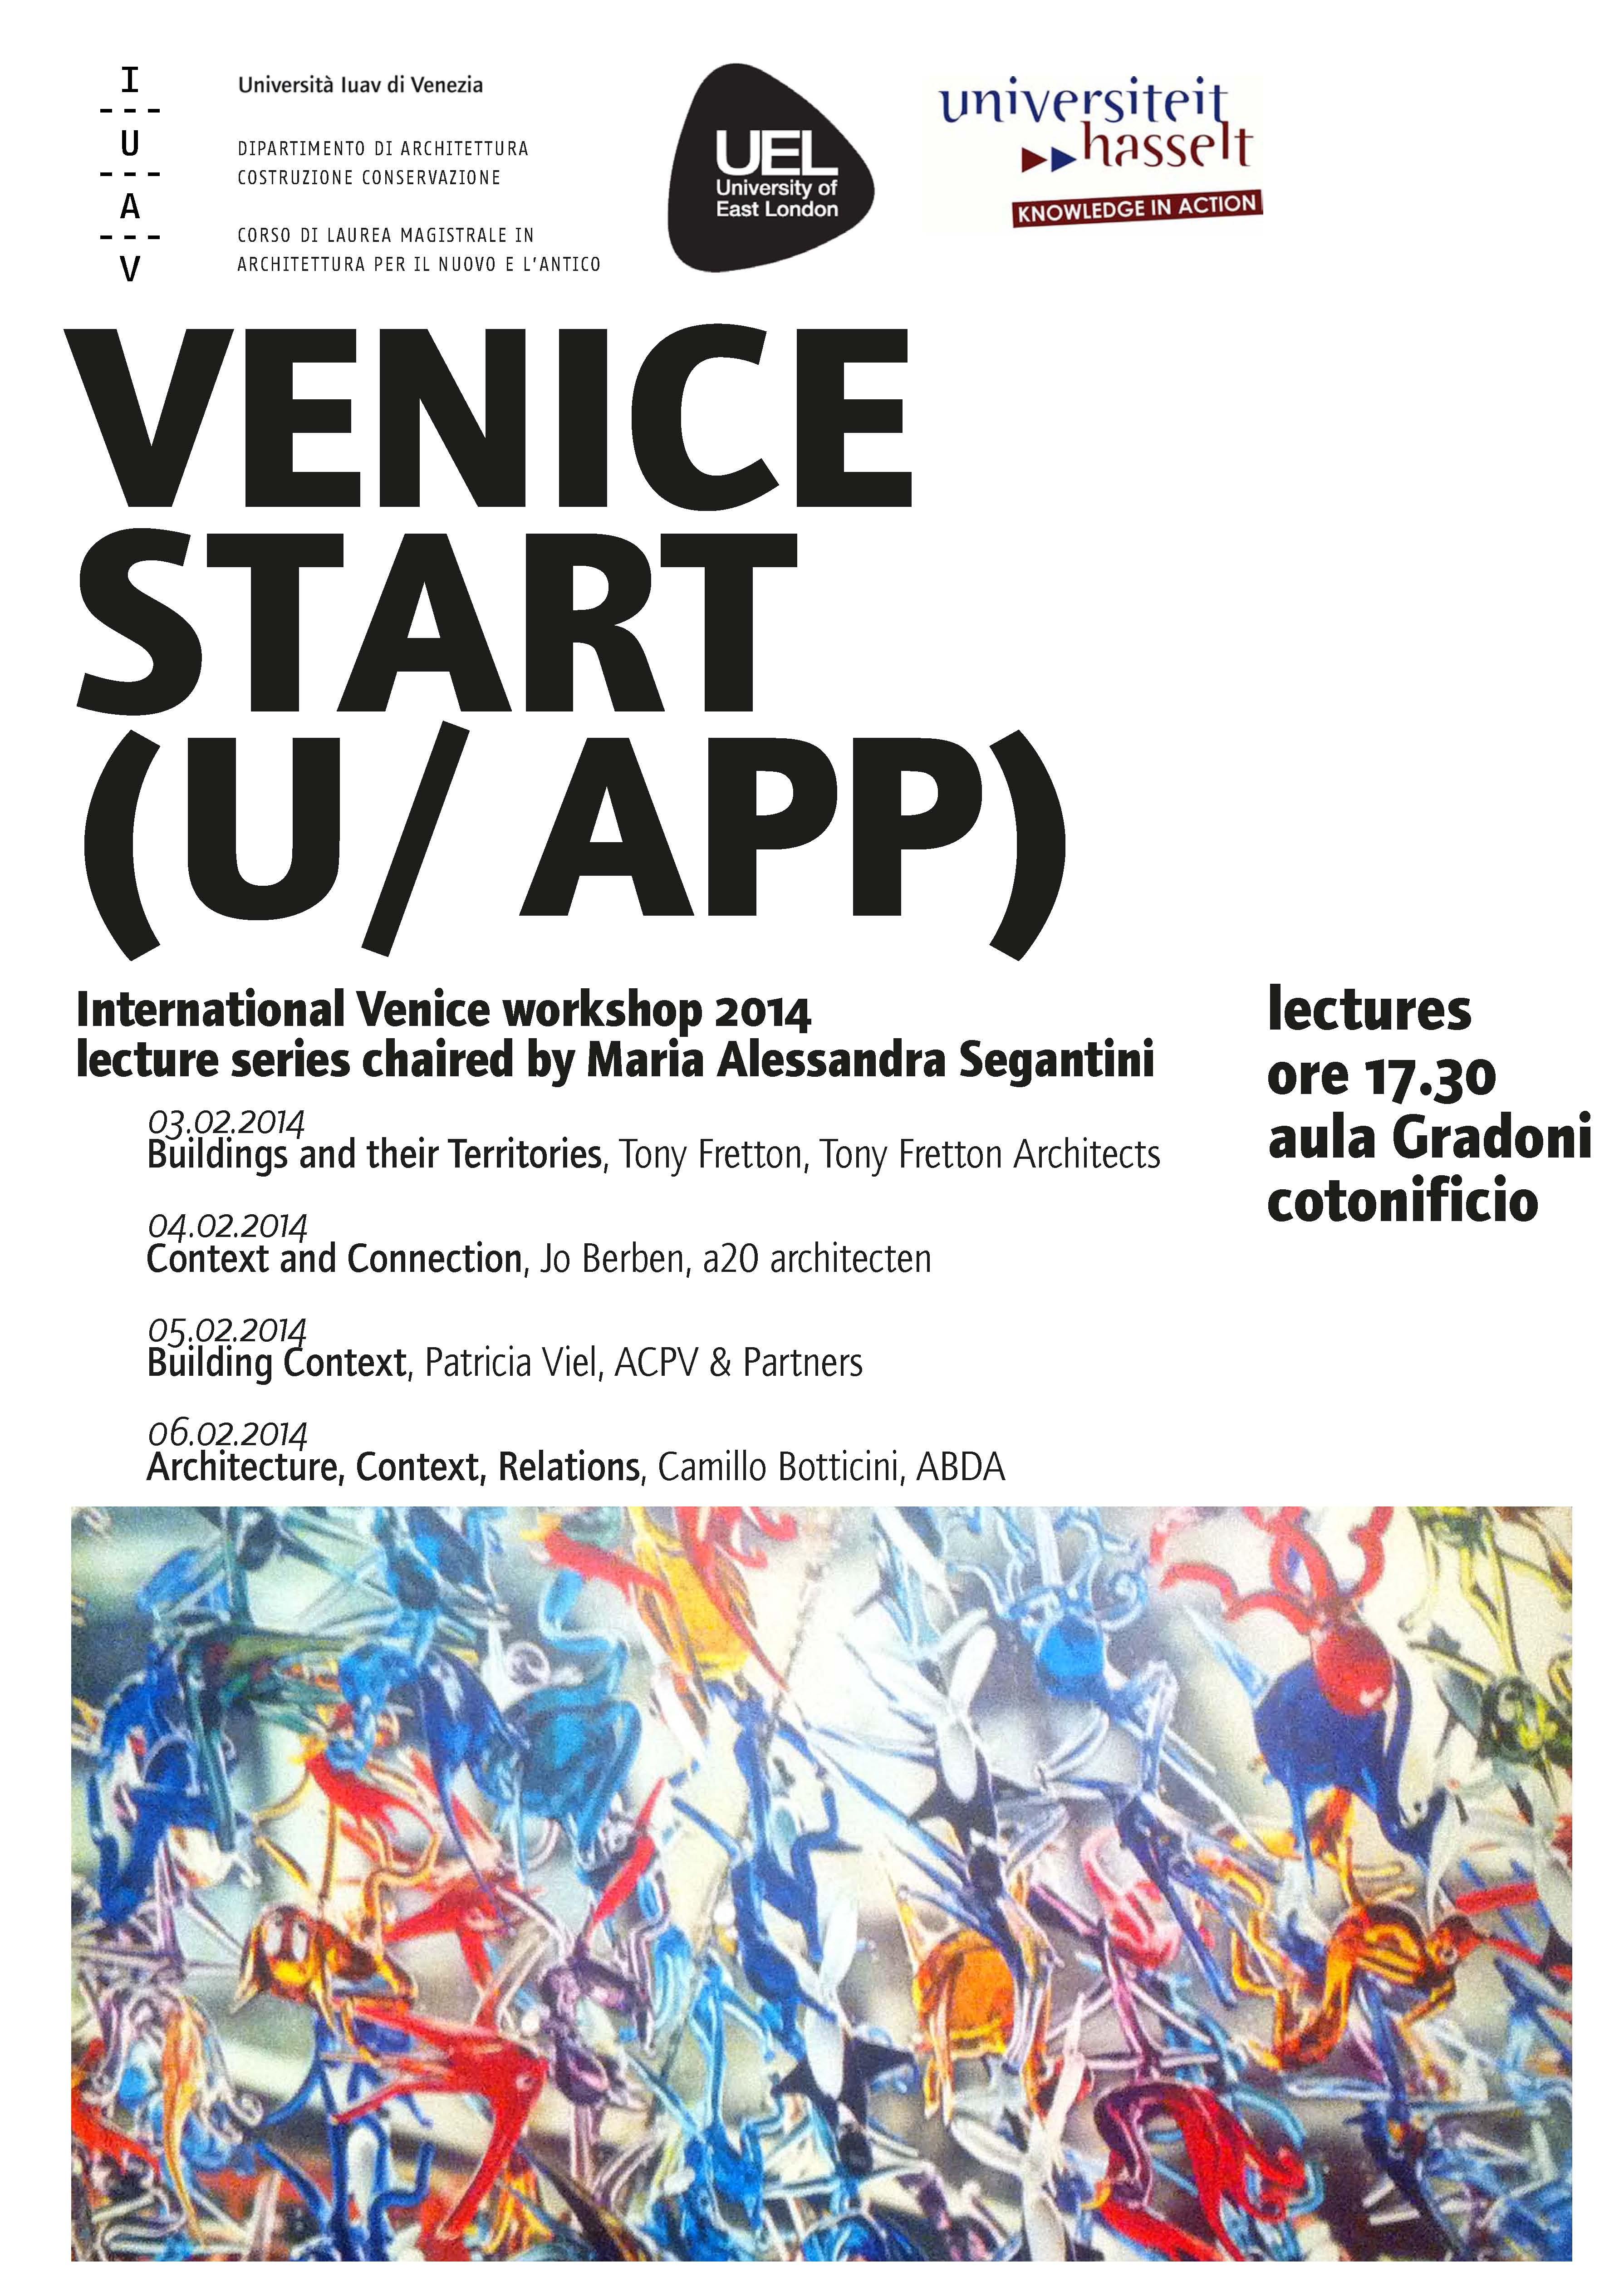 140402_international_venice_workshop_2014_lectures